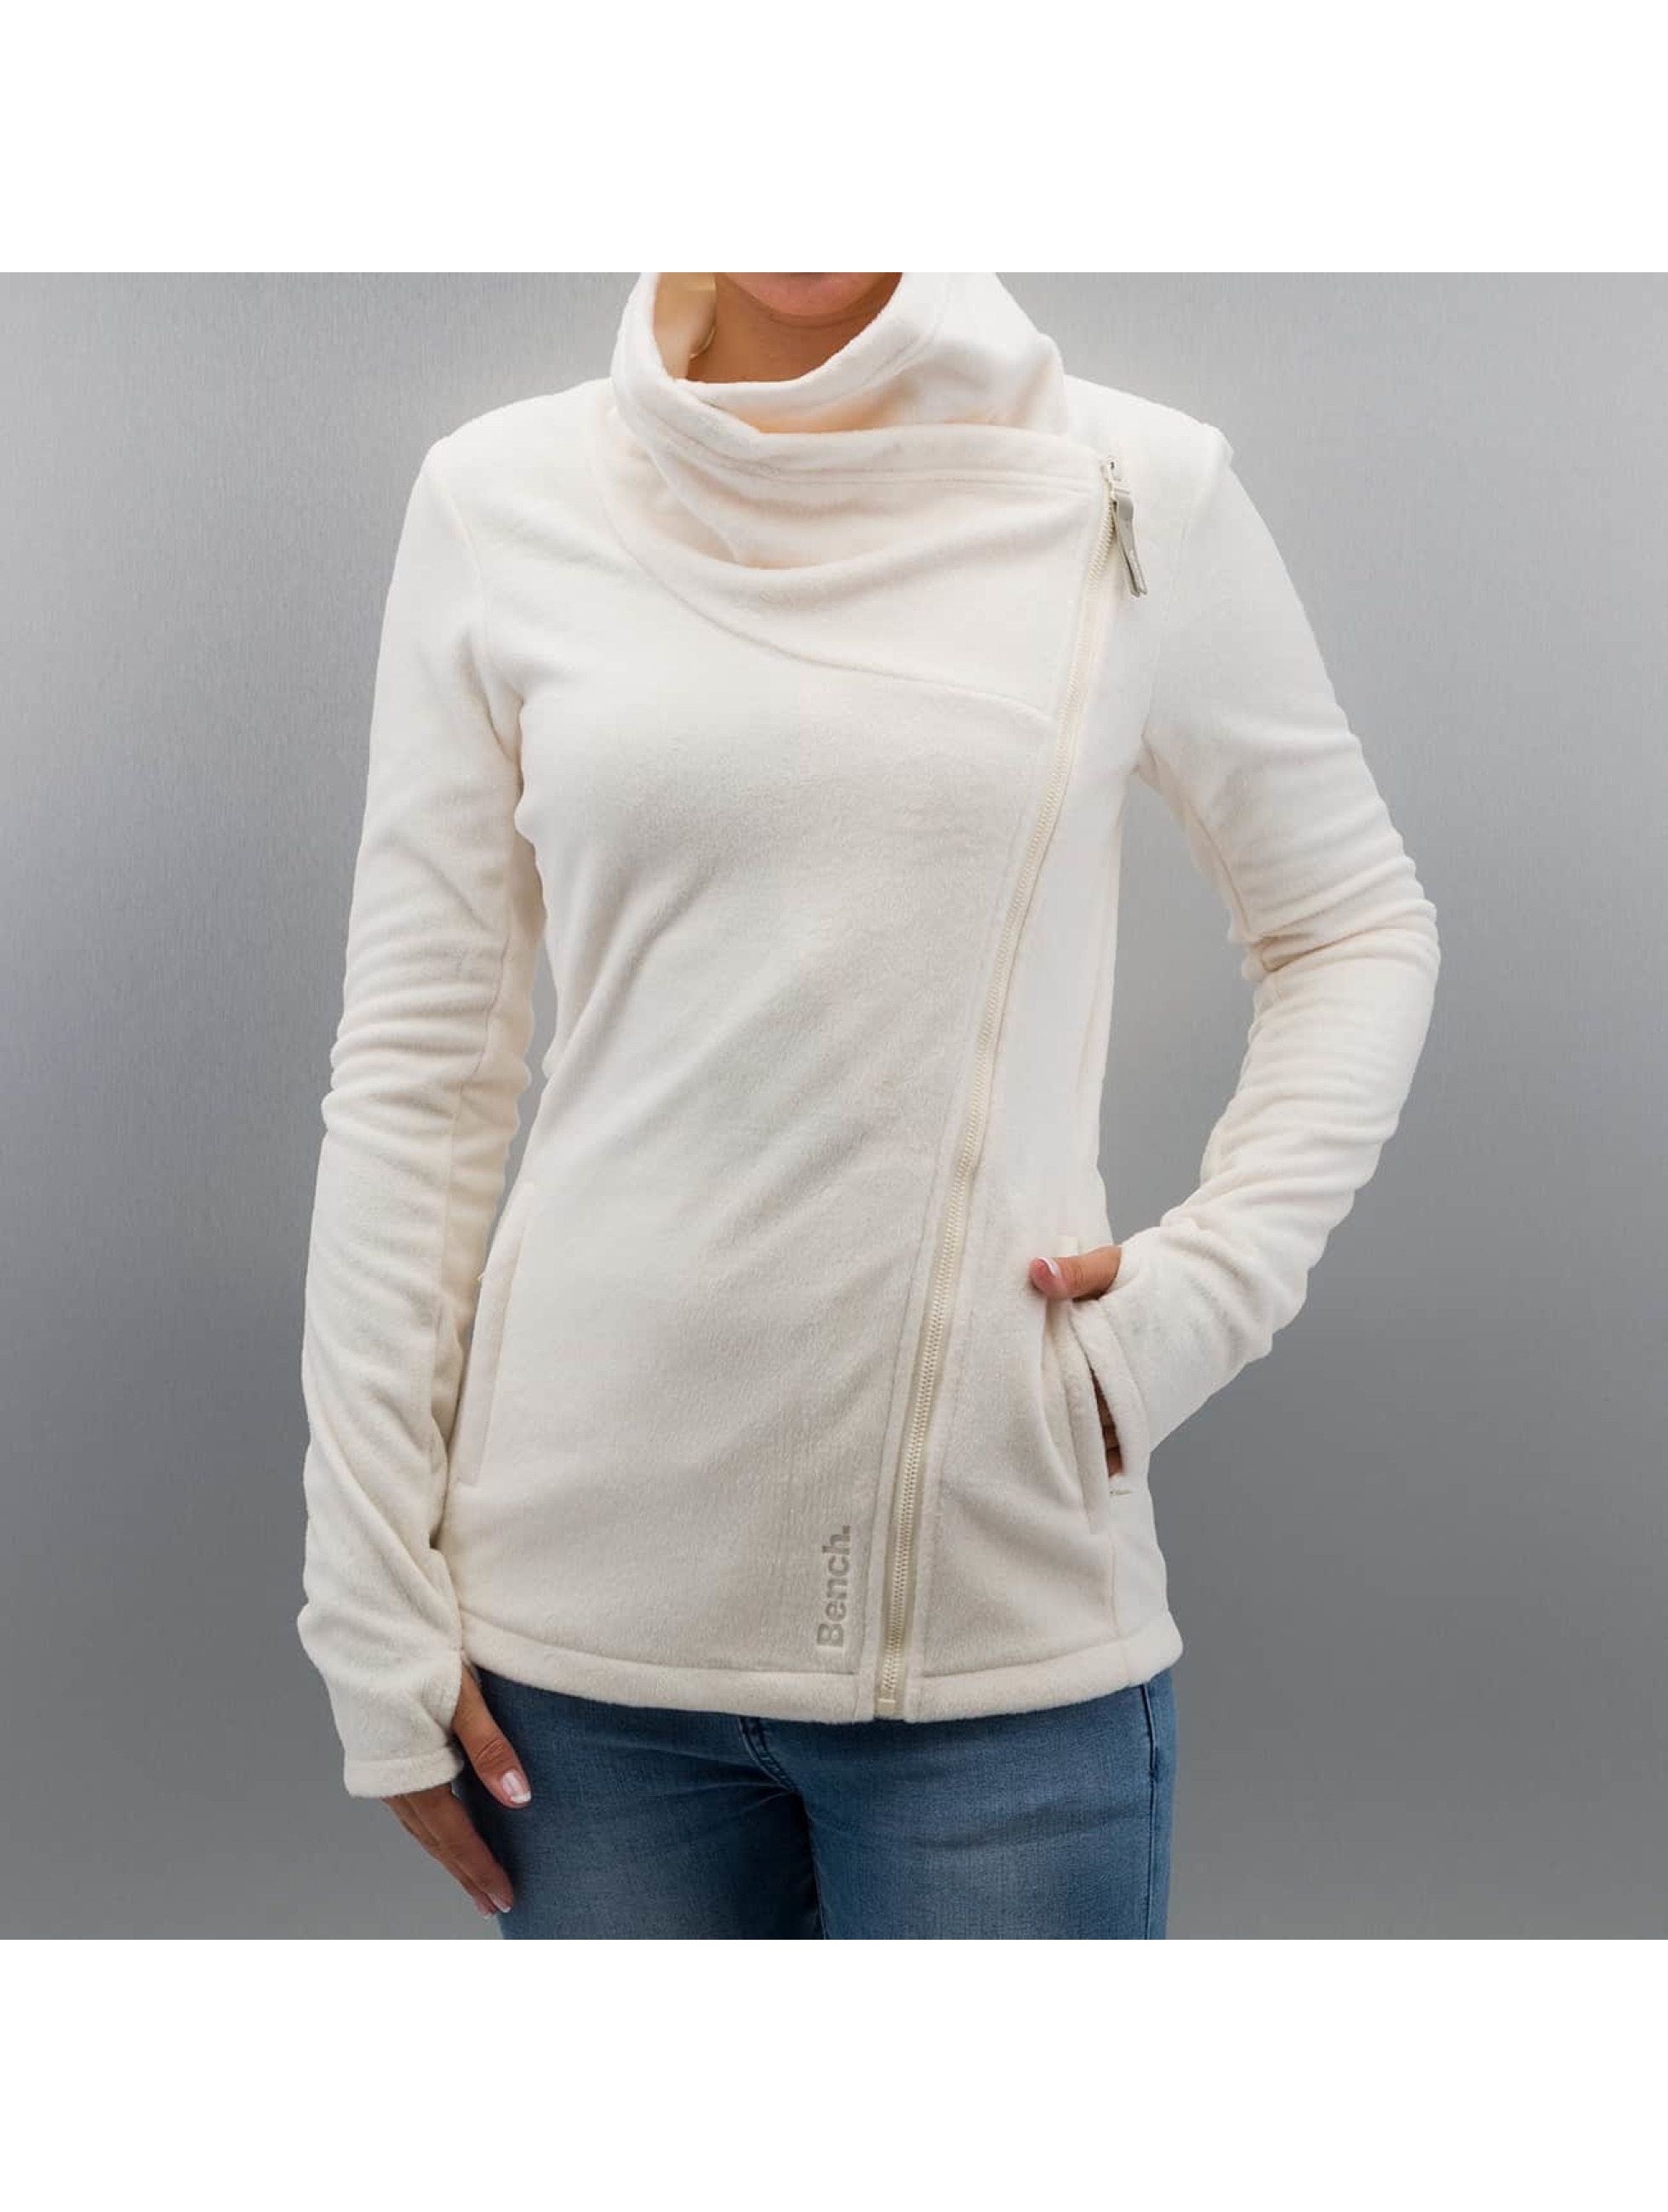 Bench Transitional Jackets Riskrunner B Fleece Jacket beige